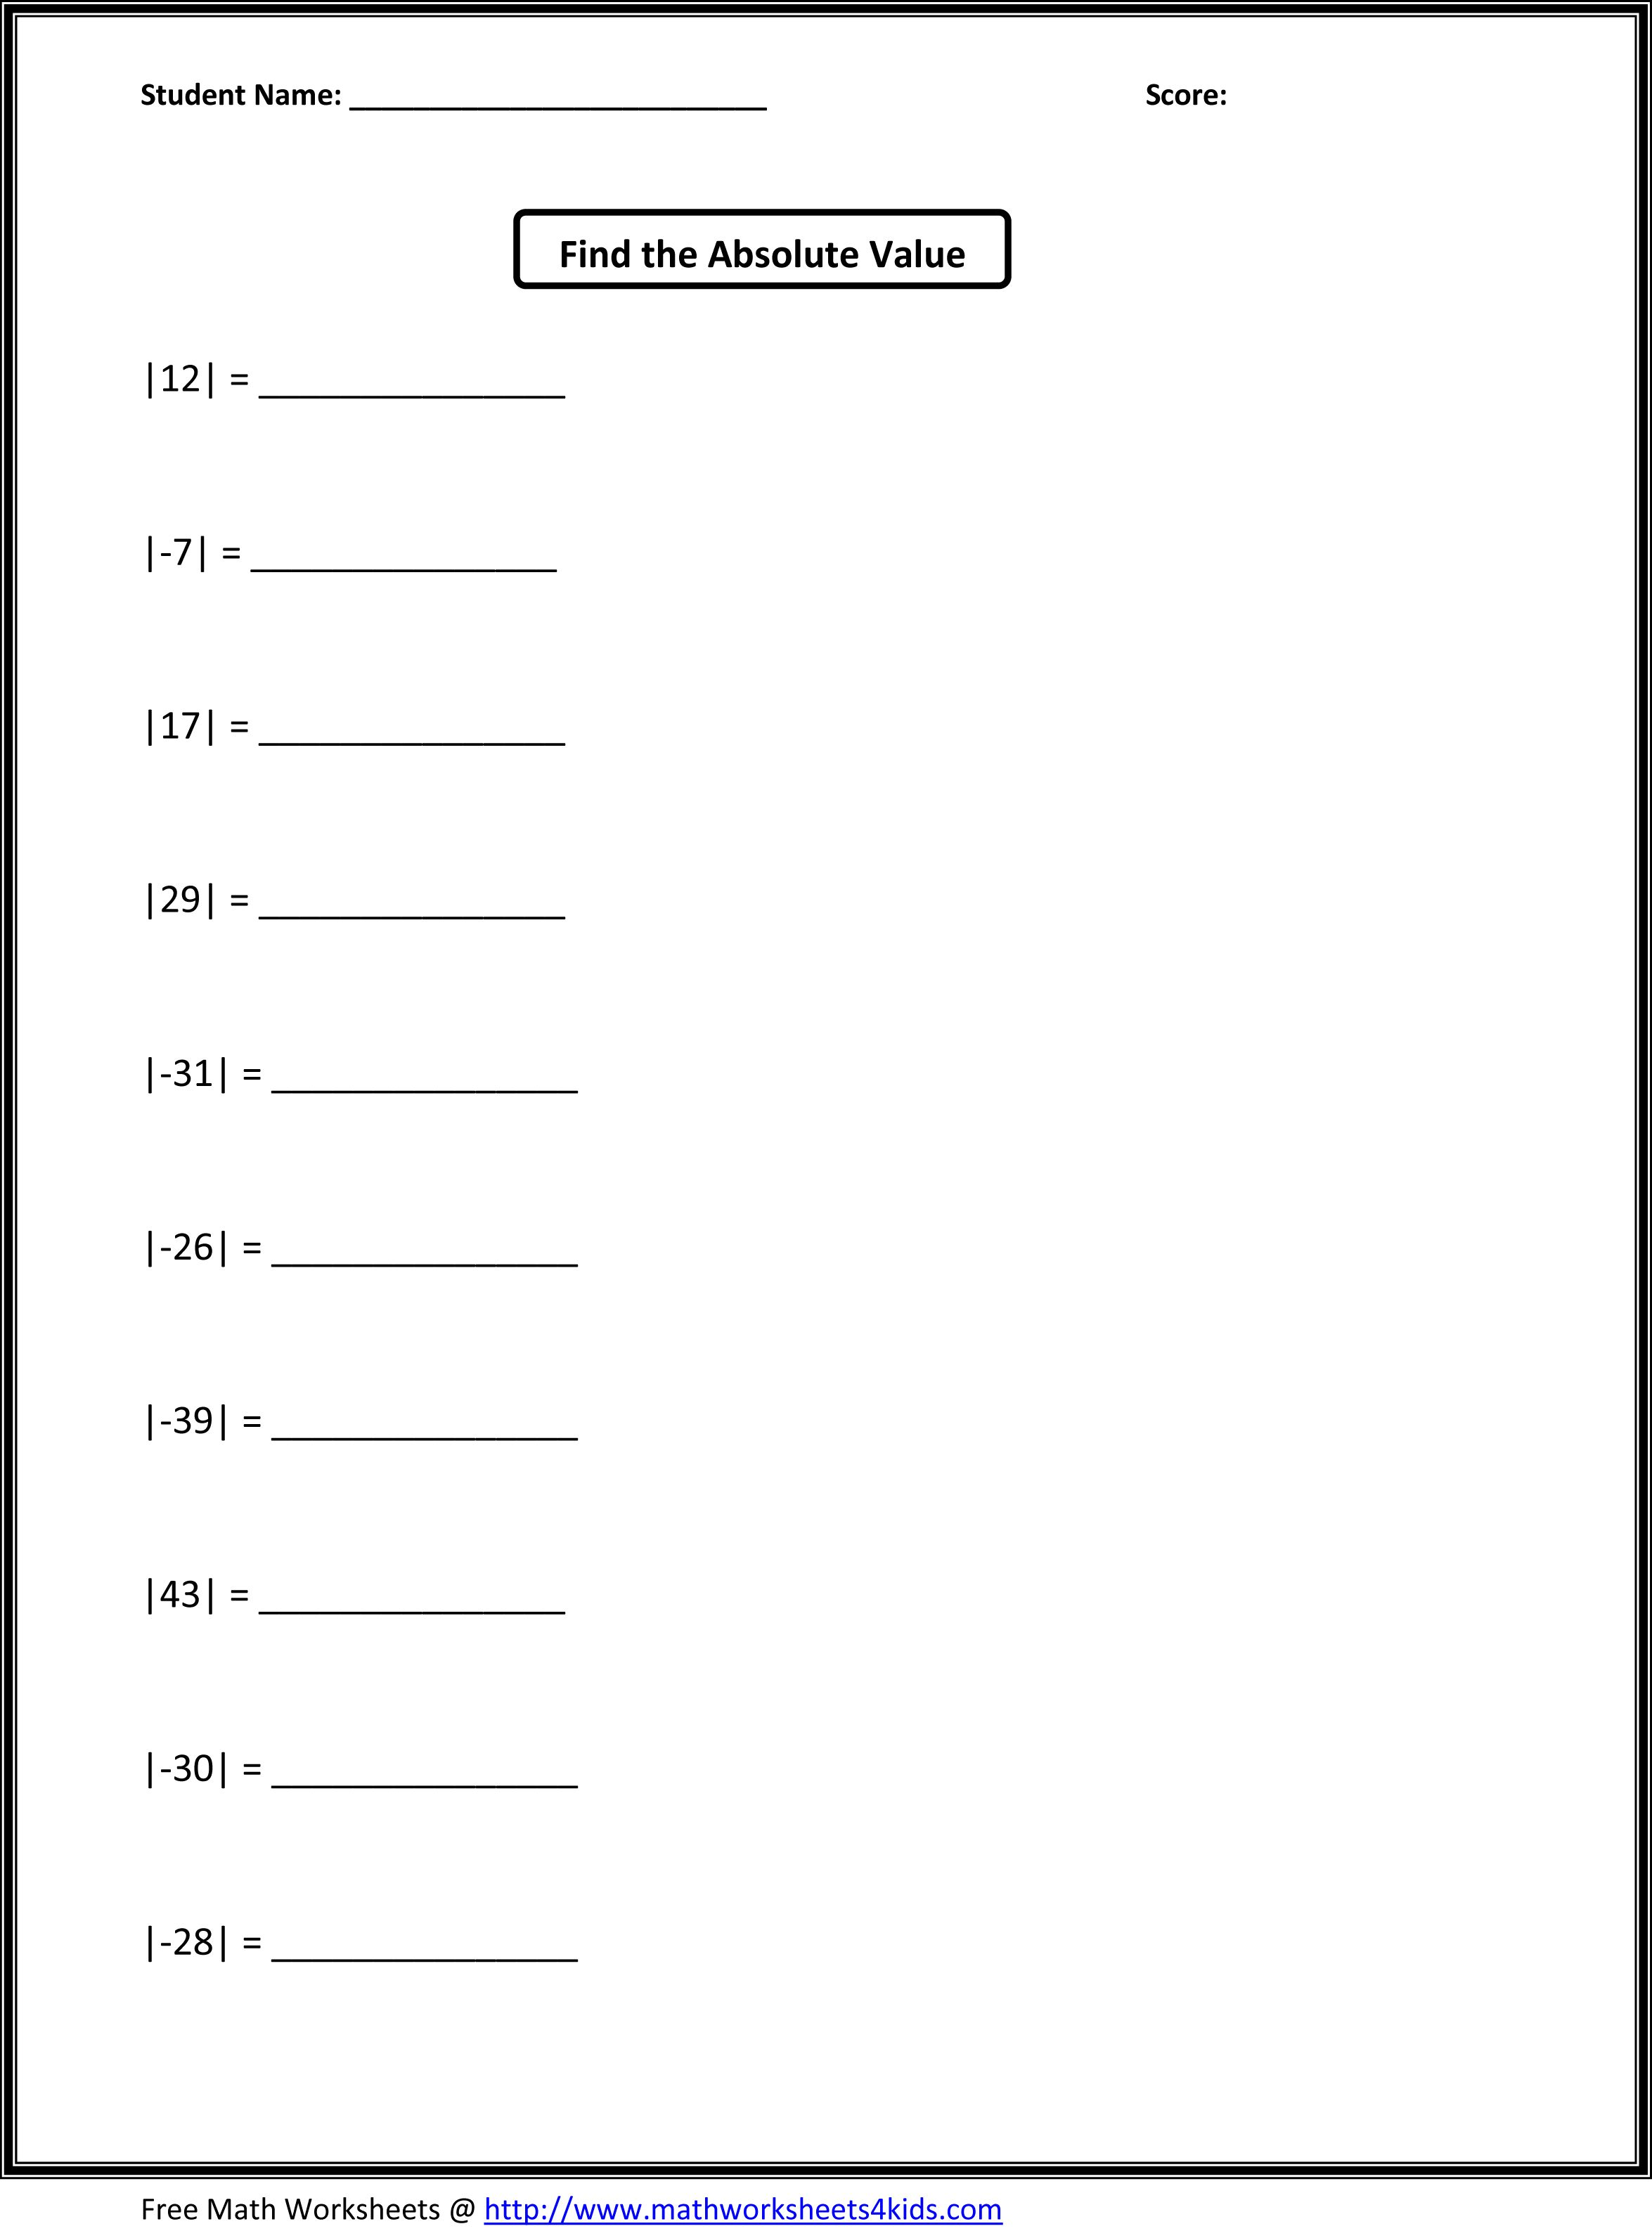 Fifth Grade Math Worksheets   Free math worksheets [ 3174 x 2350 Pixel ]